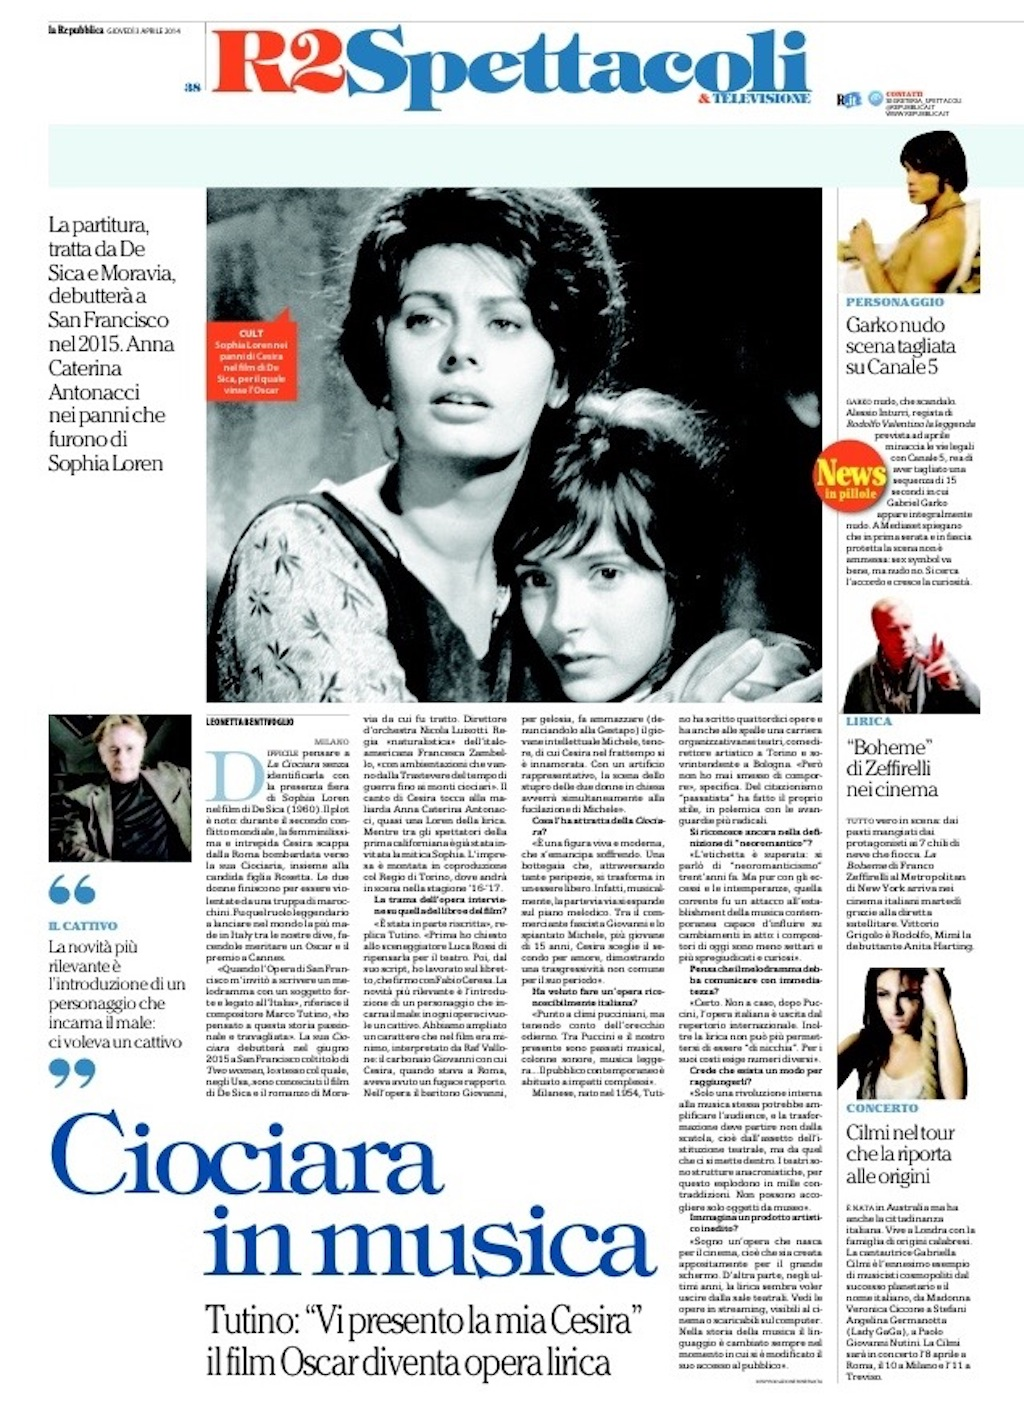 LA REPUBBLICA Aprile 2014 - La Ciociara